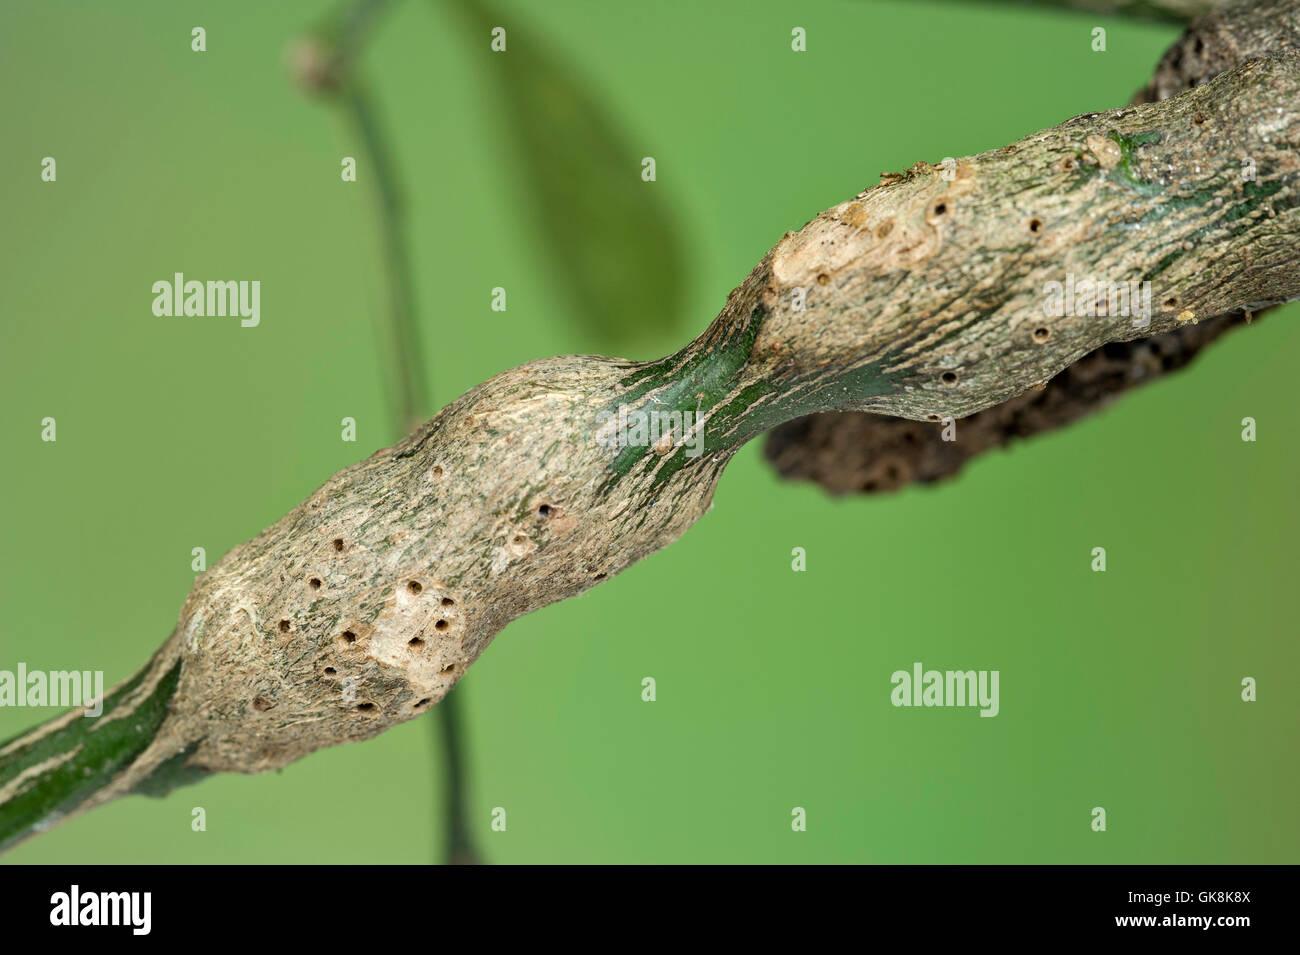 Citrus gall wasp damage to lemon tree - Stock Image